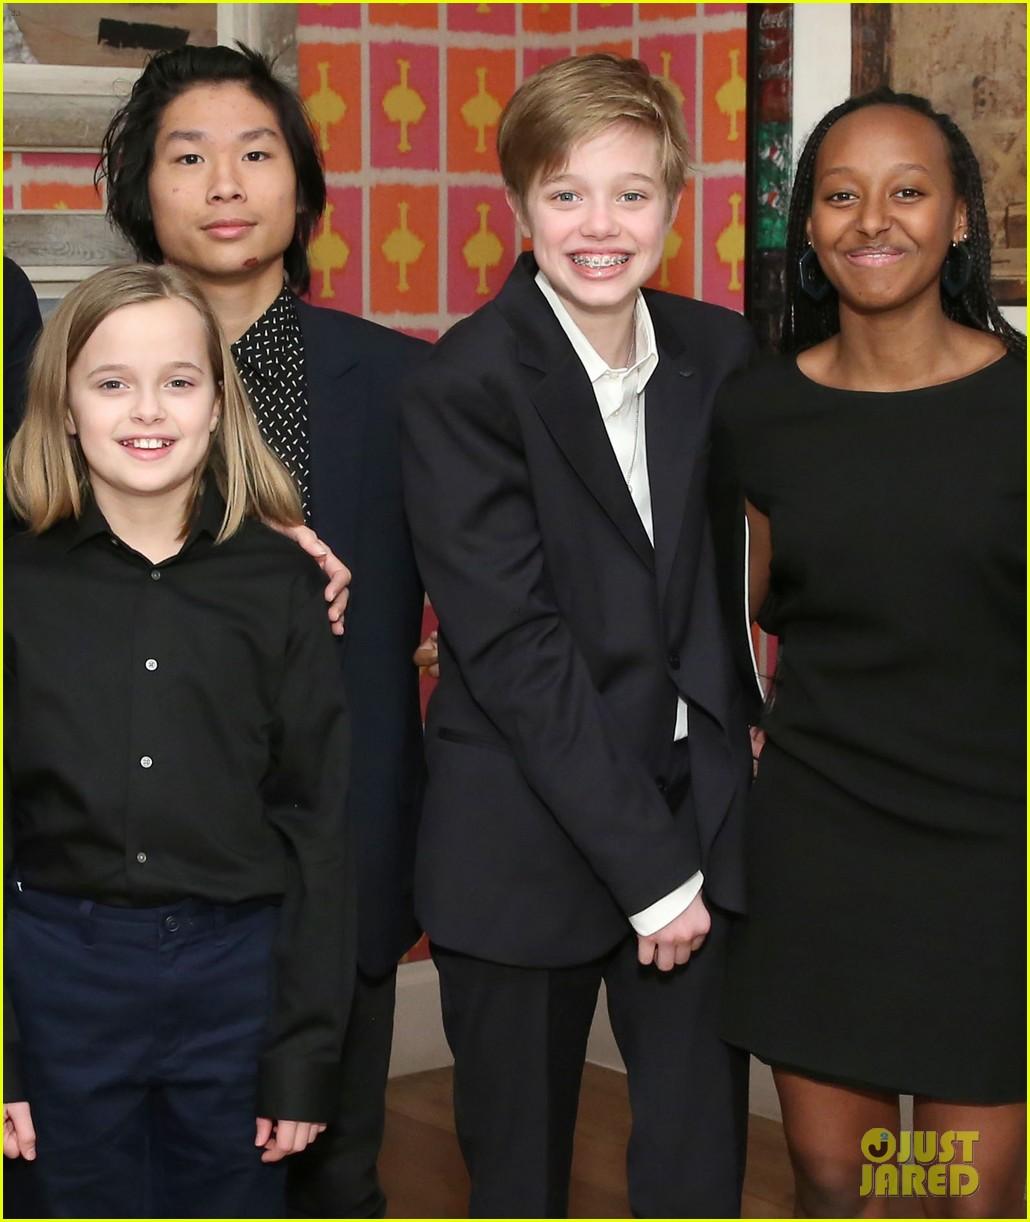 angelina jolie hosts screening with all six children 08